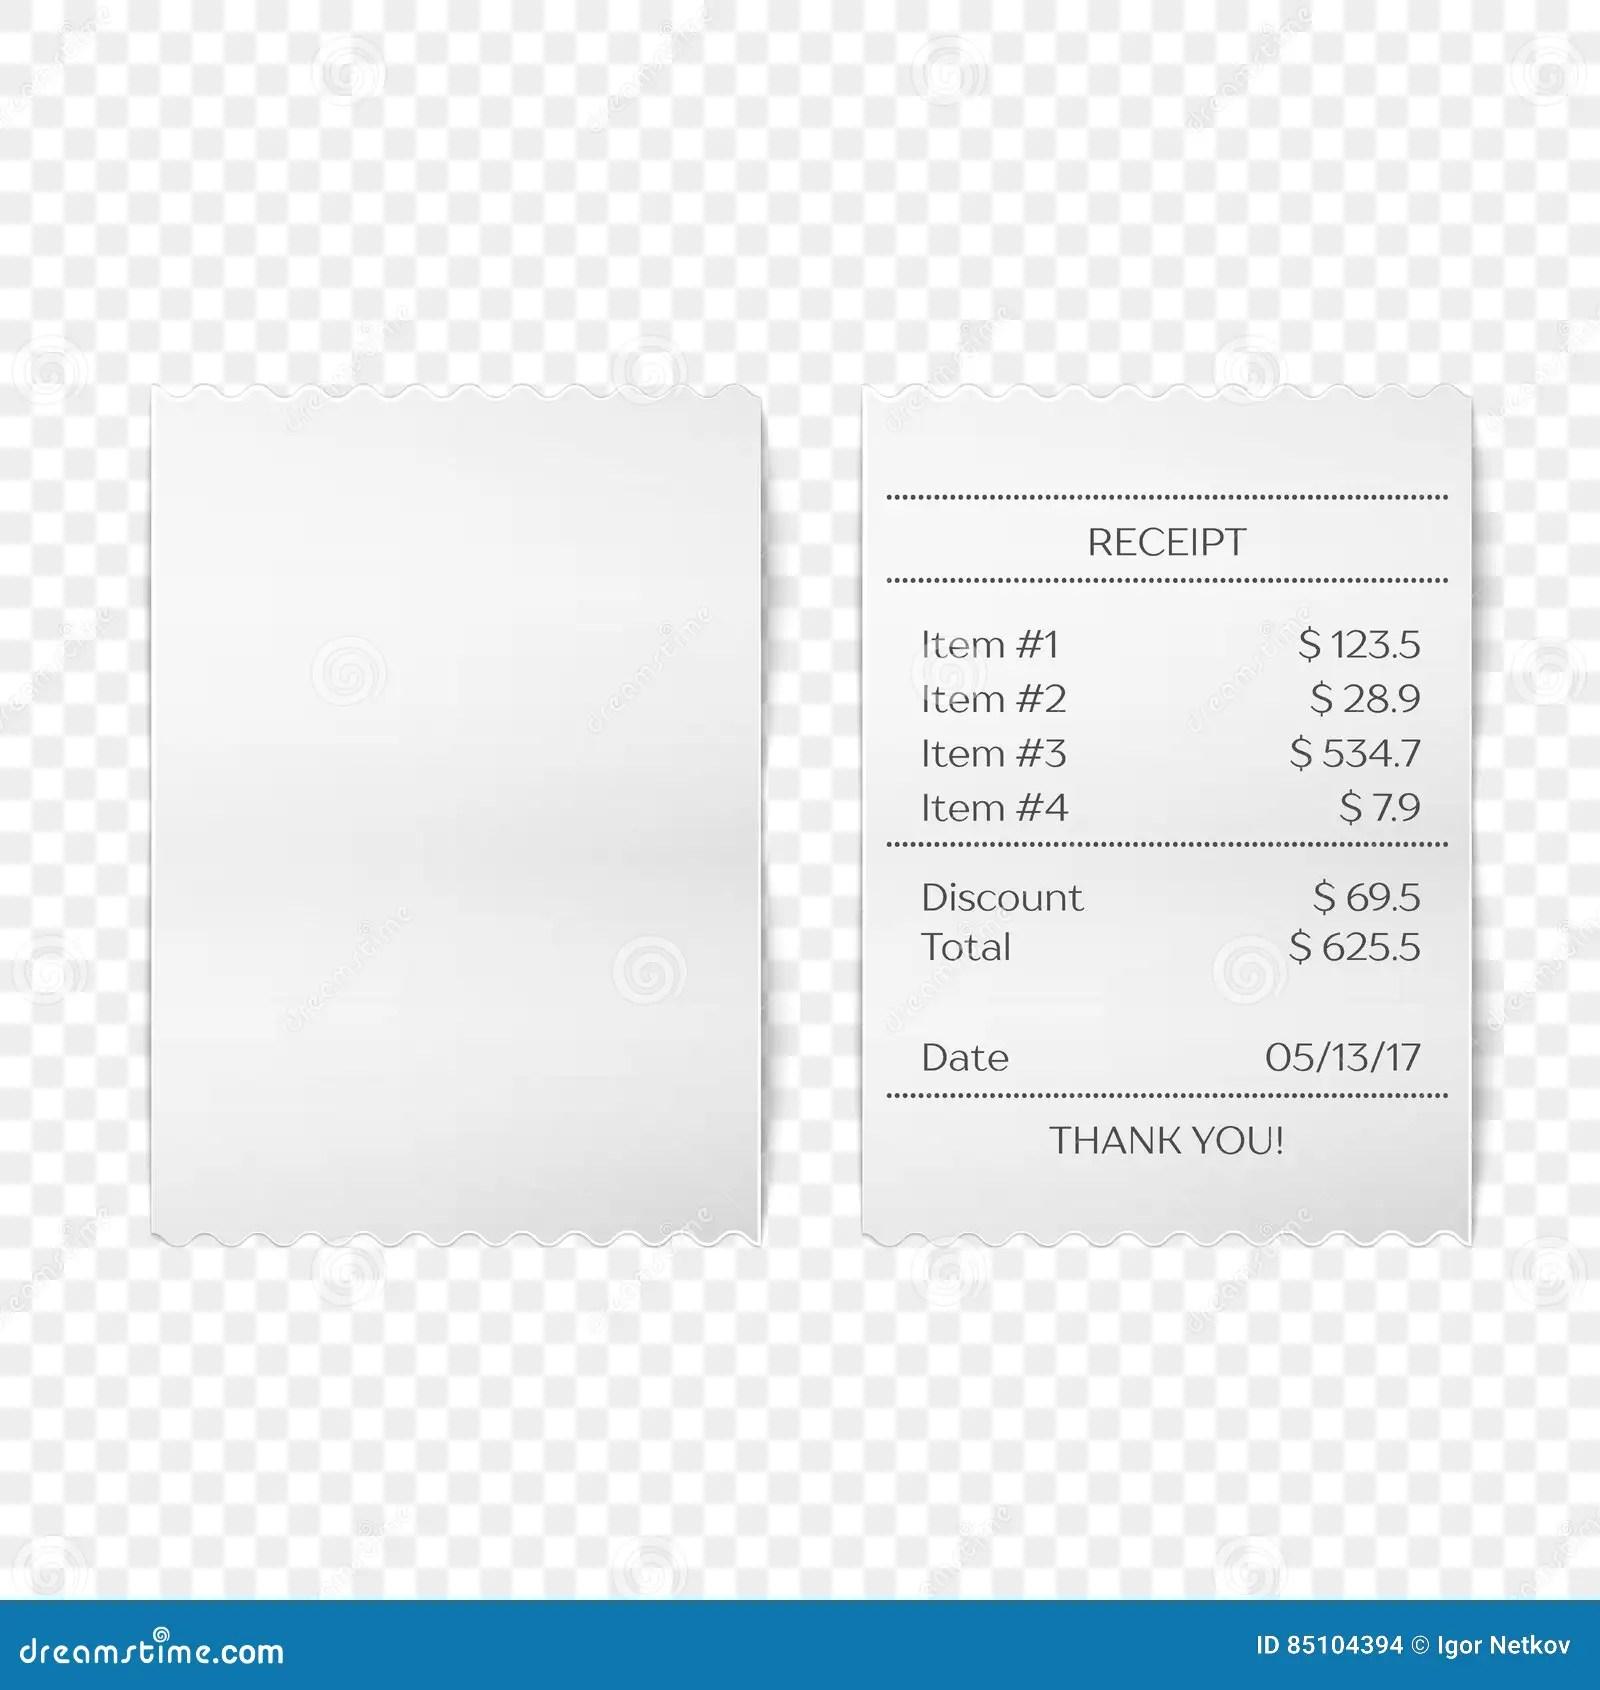 Printed receipt vector stock vector. Illustration of